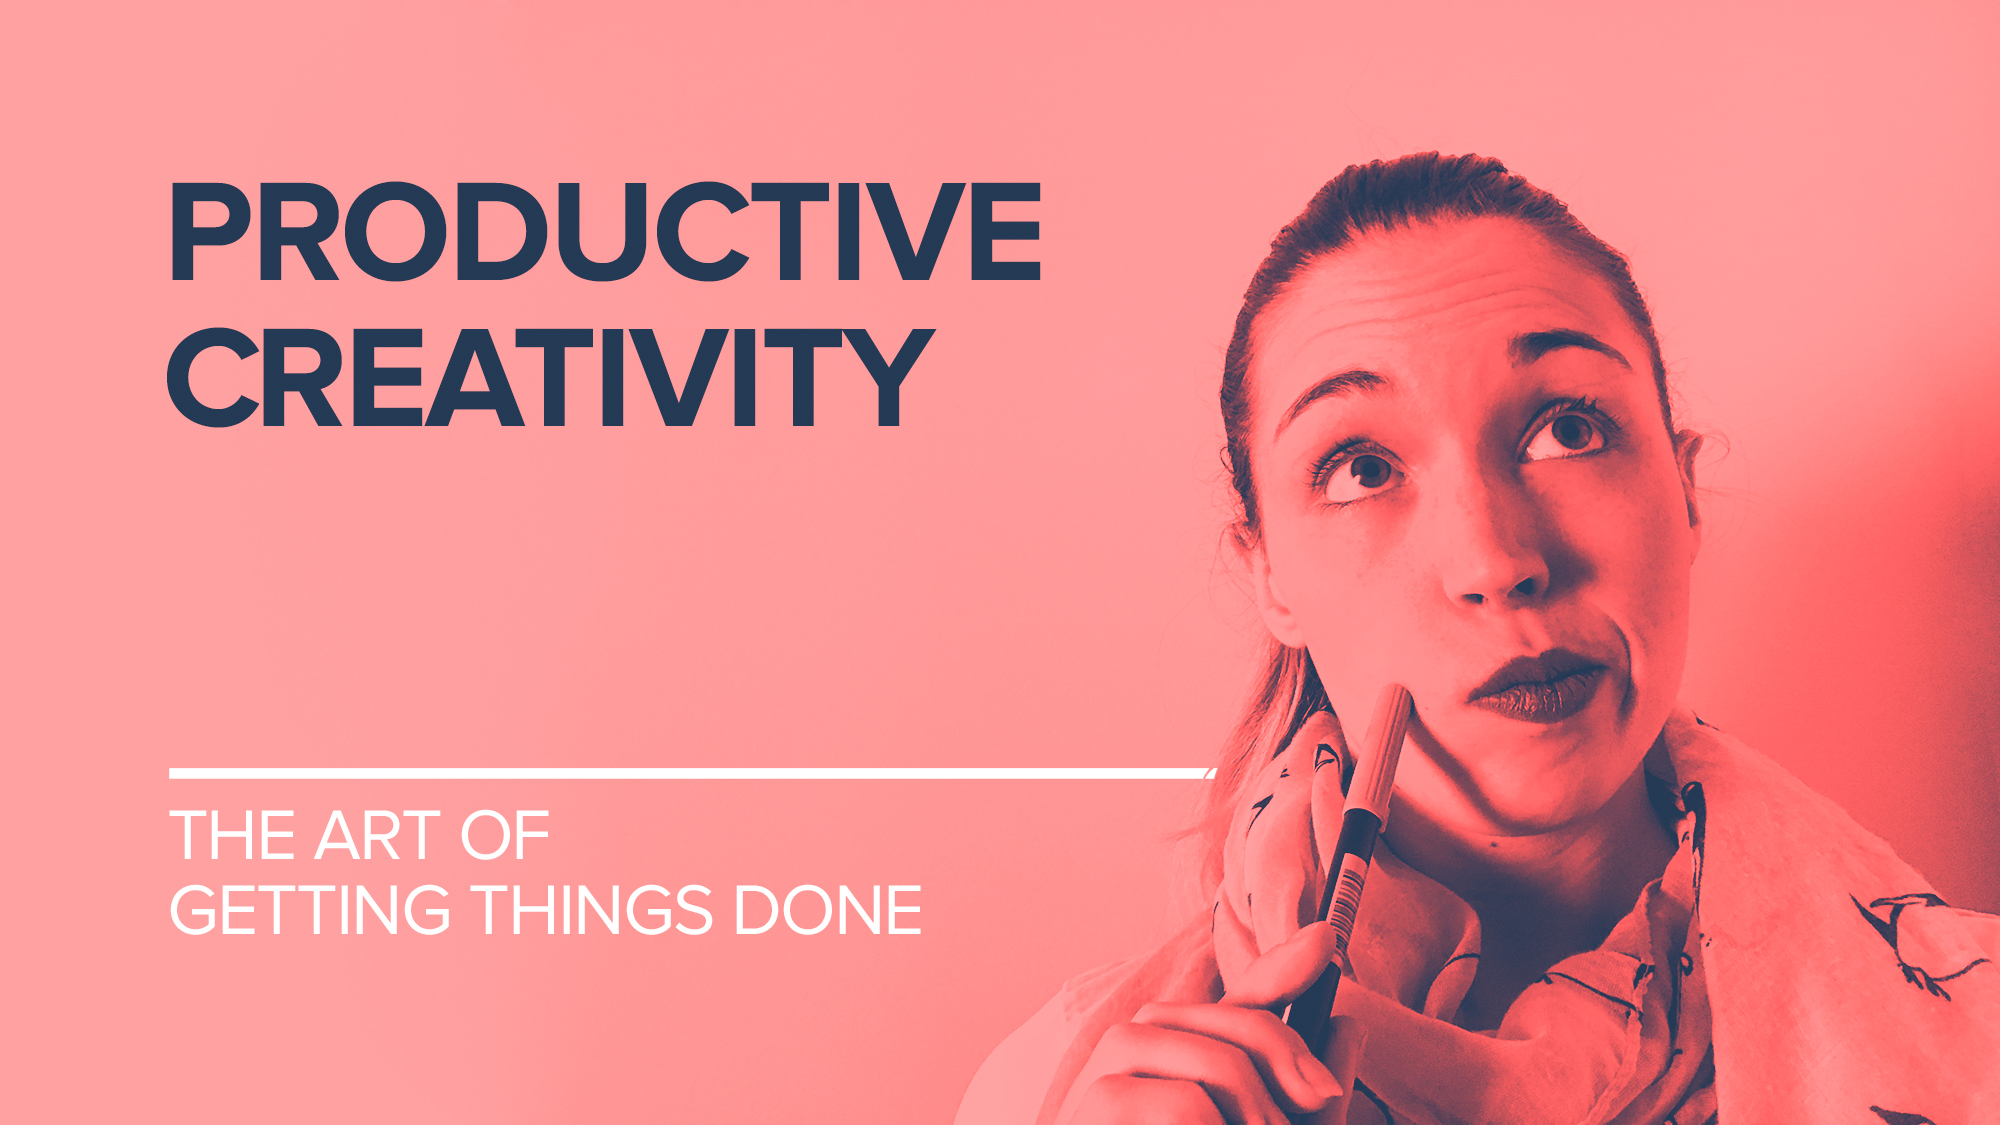 Productive creativity